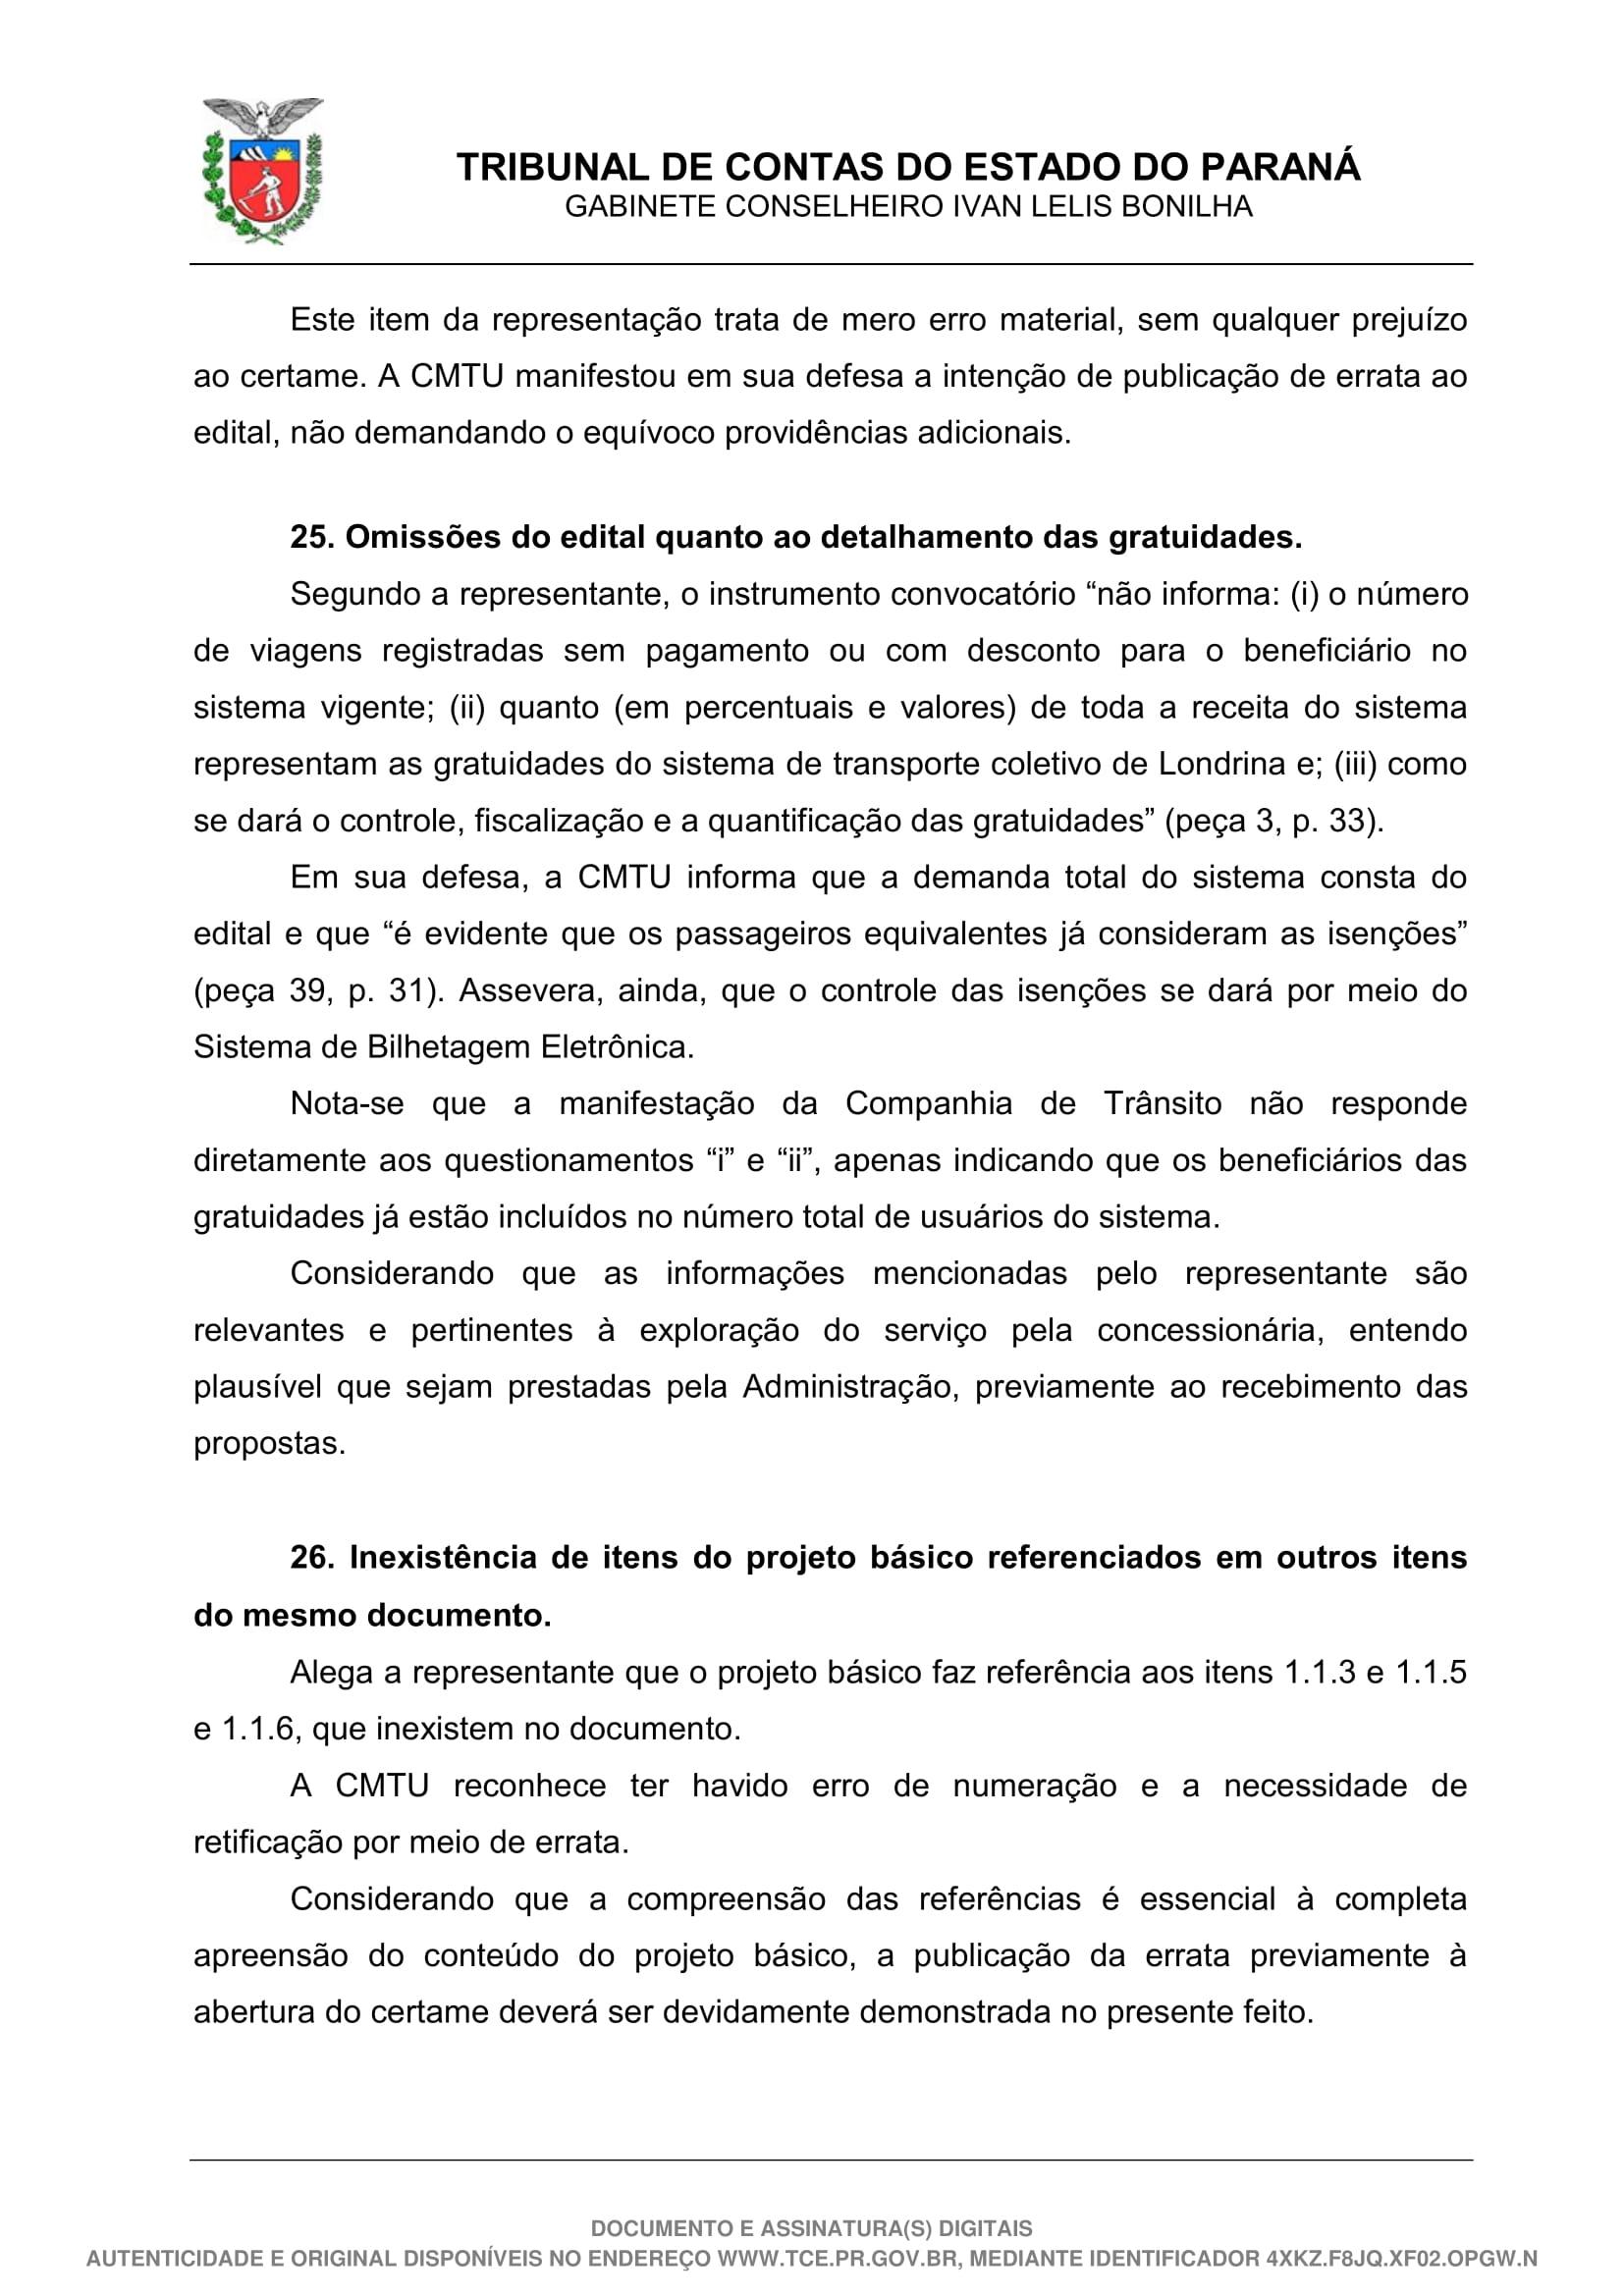 Despacho - 49-19 - GCILB-22